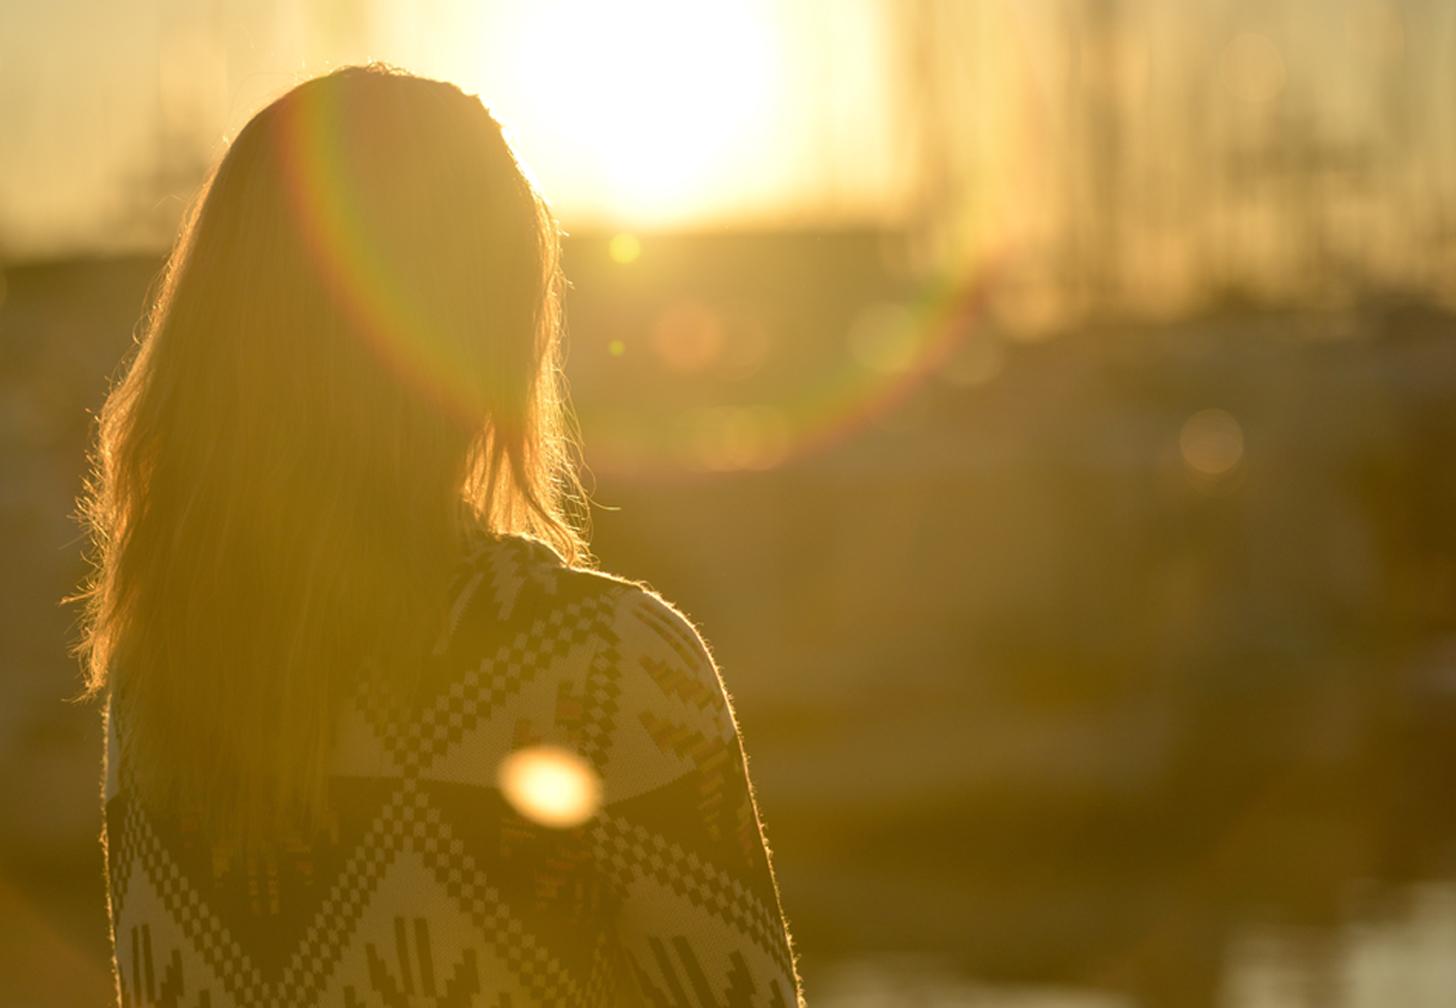 The Art of Saying No: Setting Healthy Boundaries As An Act of Self Love - NEW DATES - SUMMER 2019SAN FRANCISCO - Marina